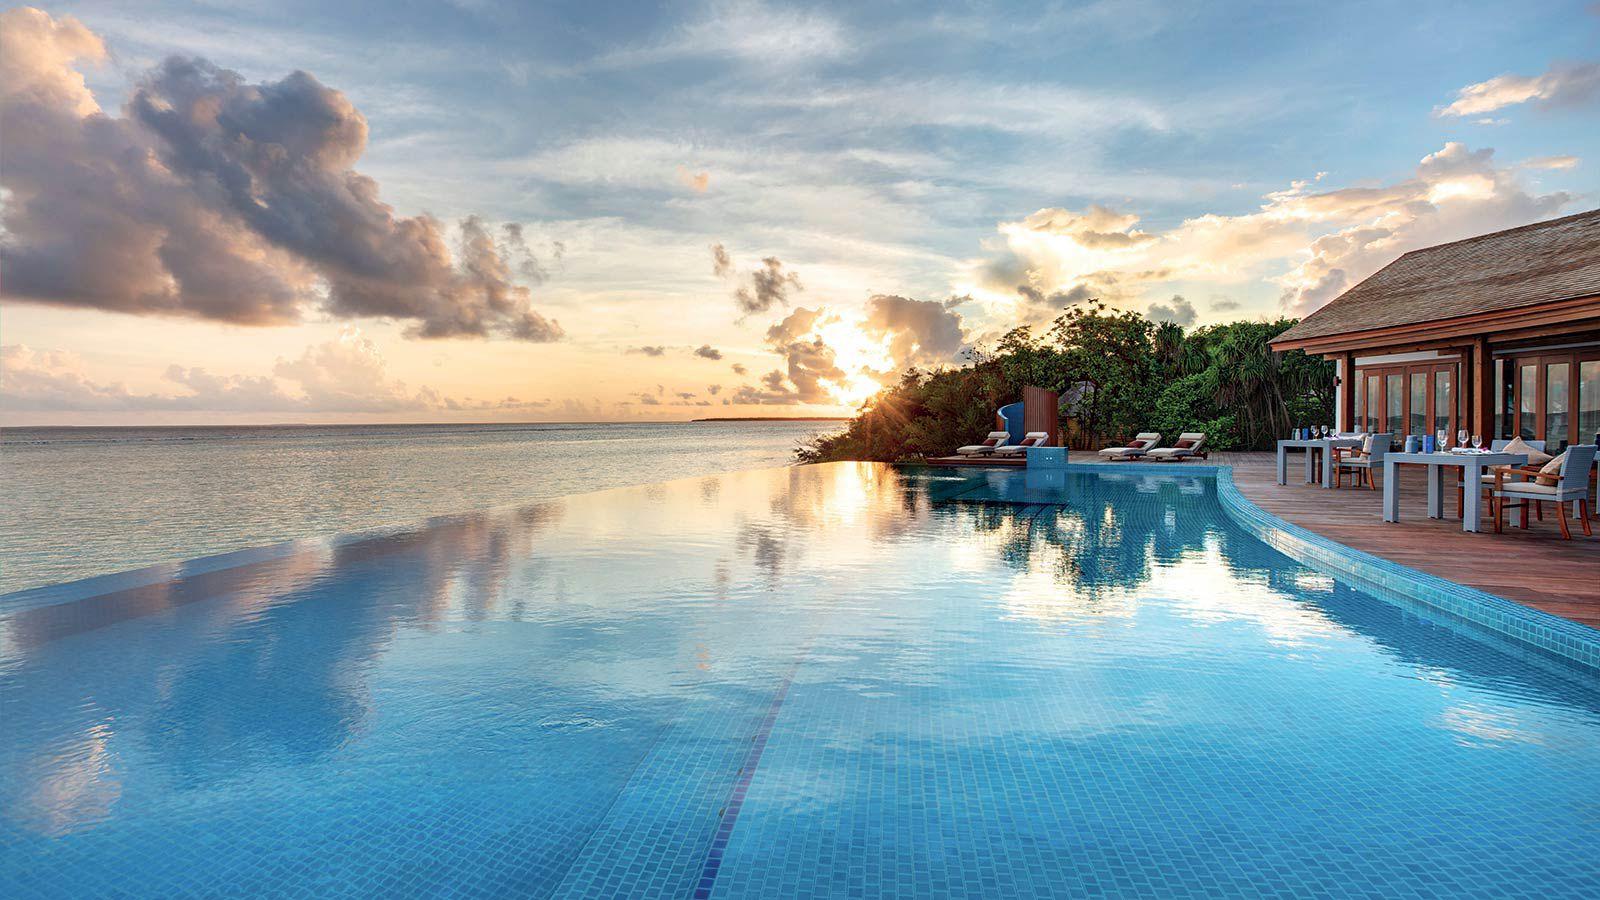 Maldives Infinity Pools Hideaway Beach Resort Spa Maldives